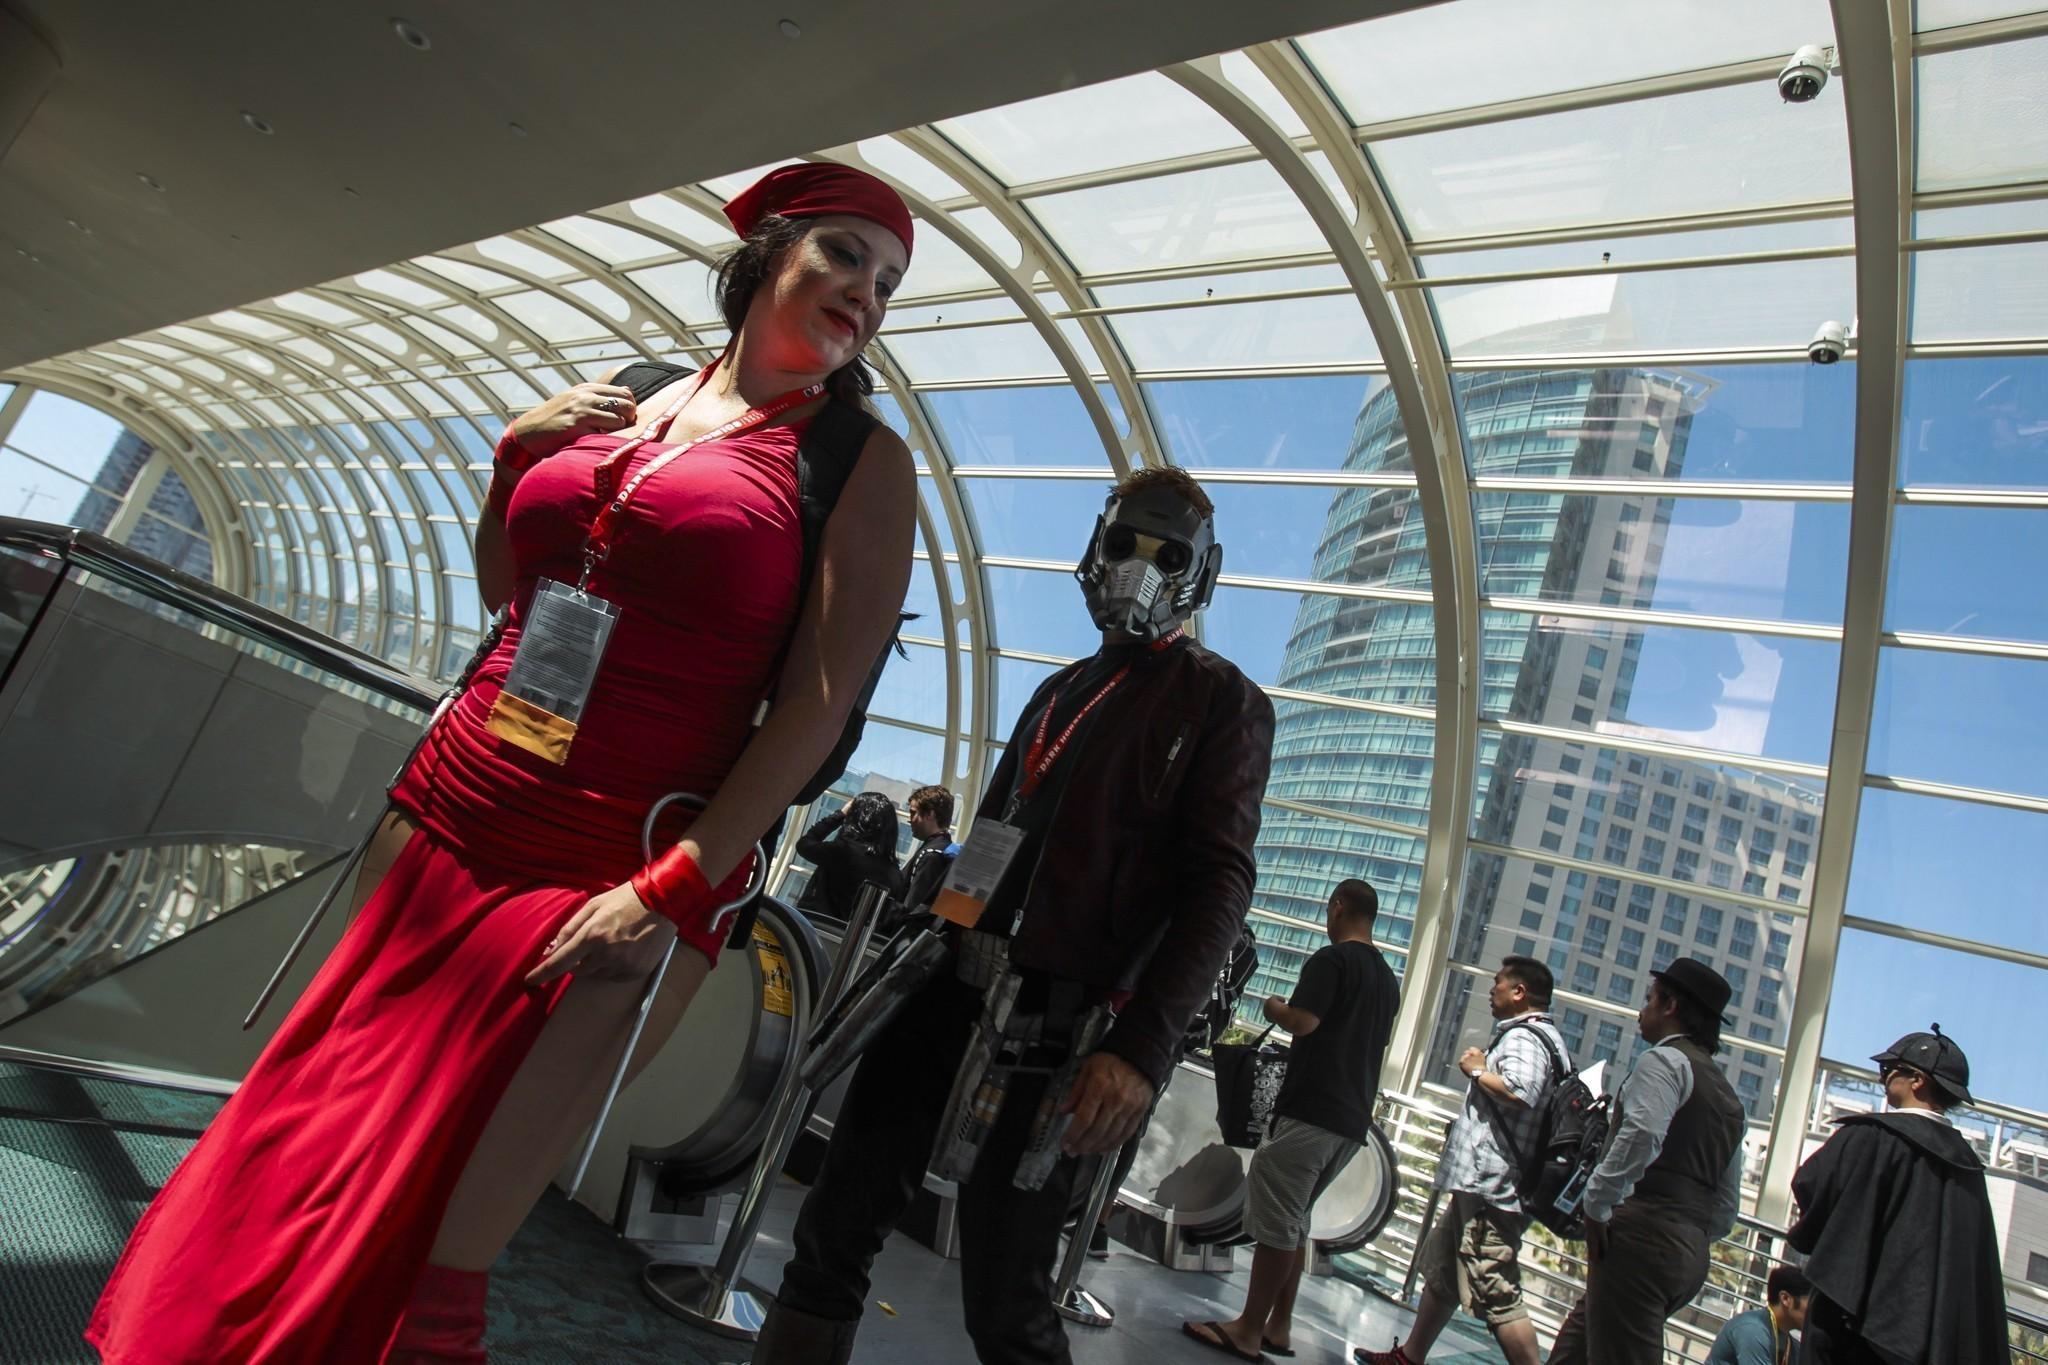 comic-con museum to open in balboa park